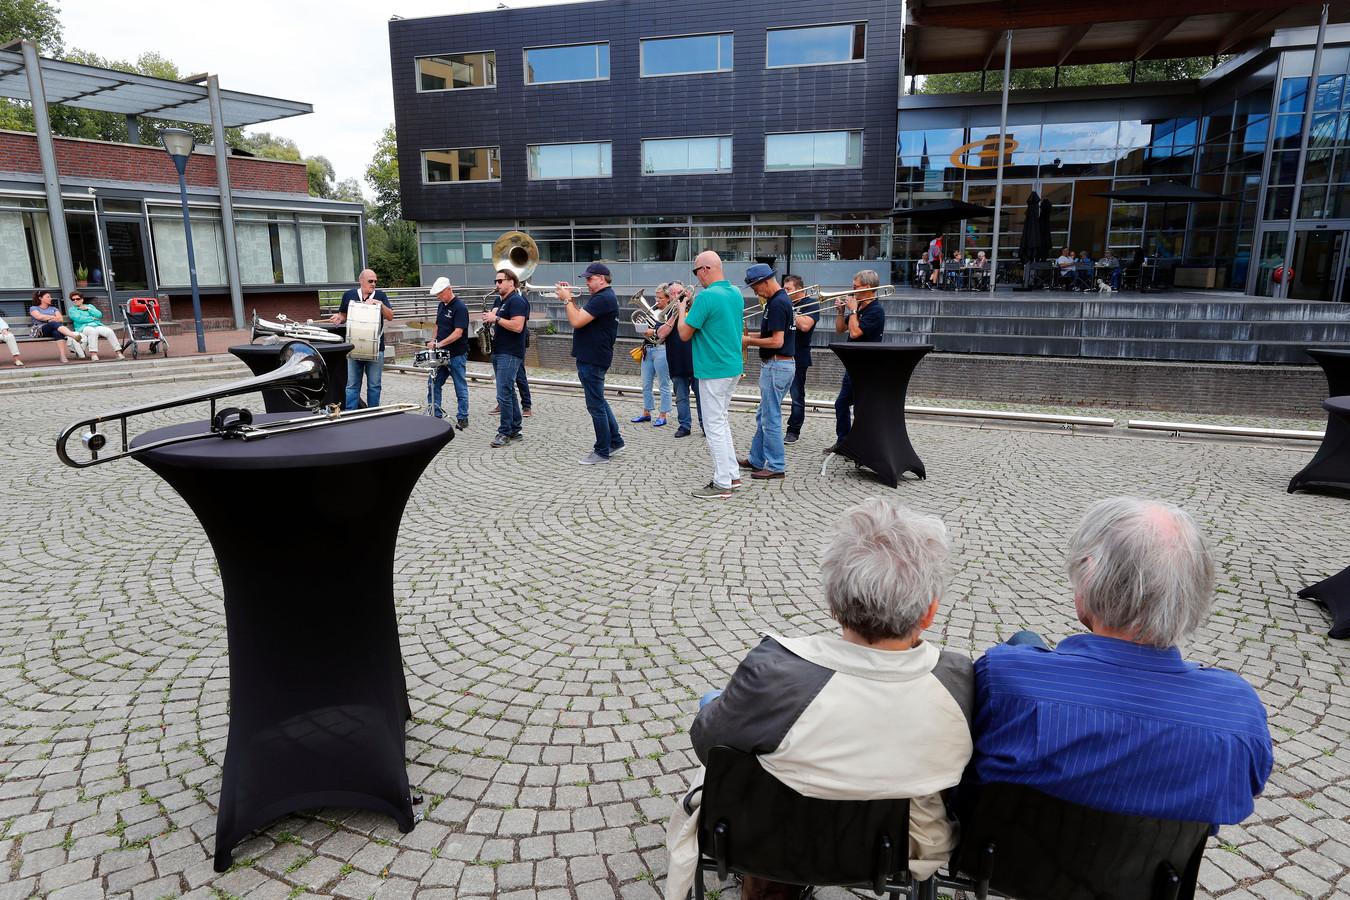 Blaaskapellen festival in Geldrop